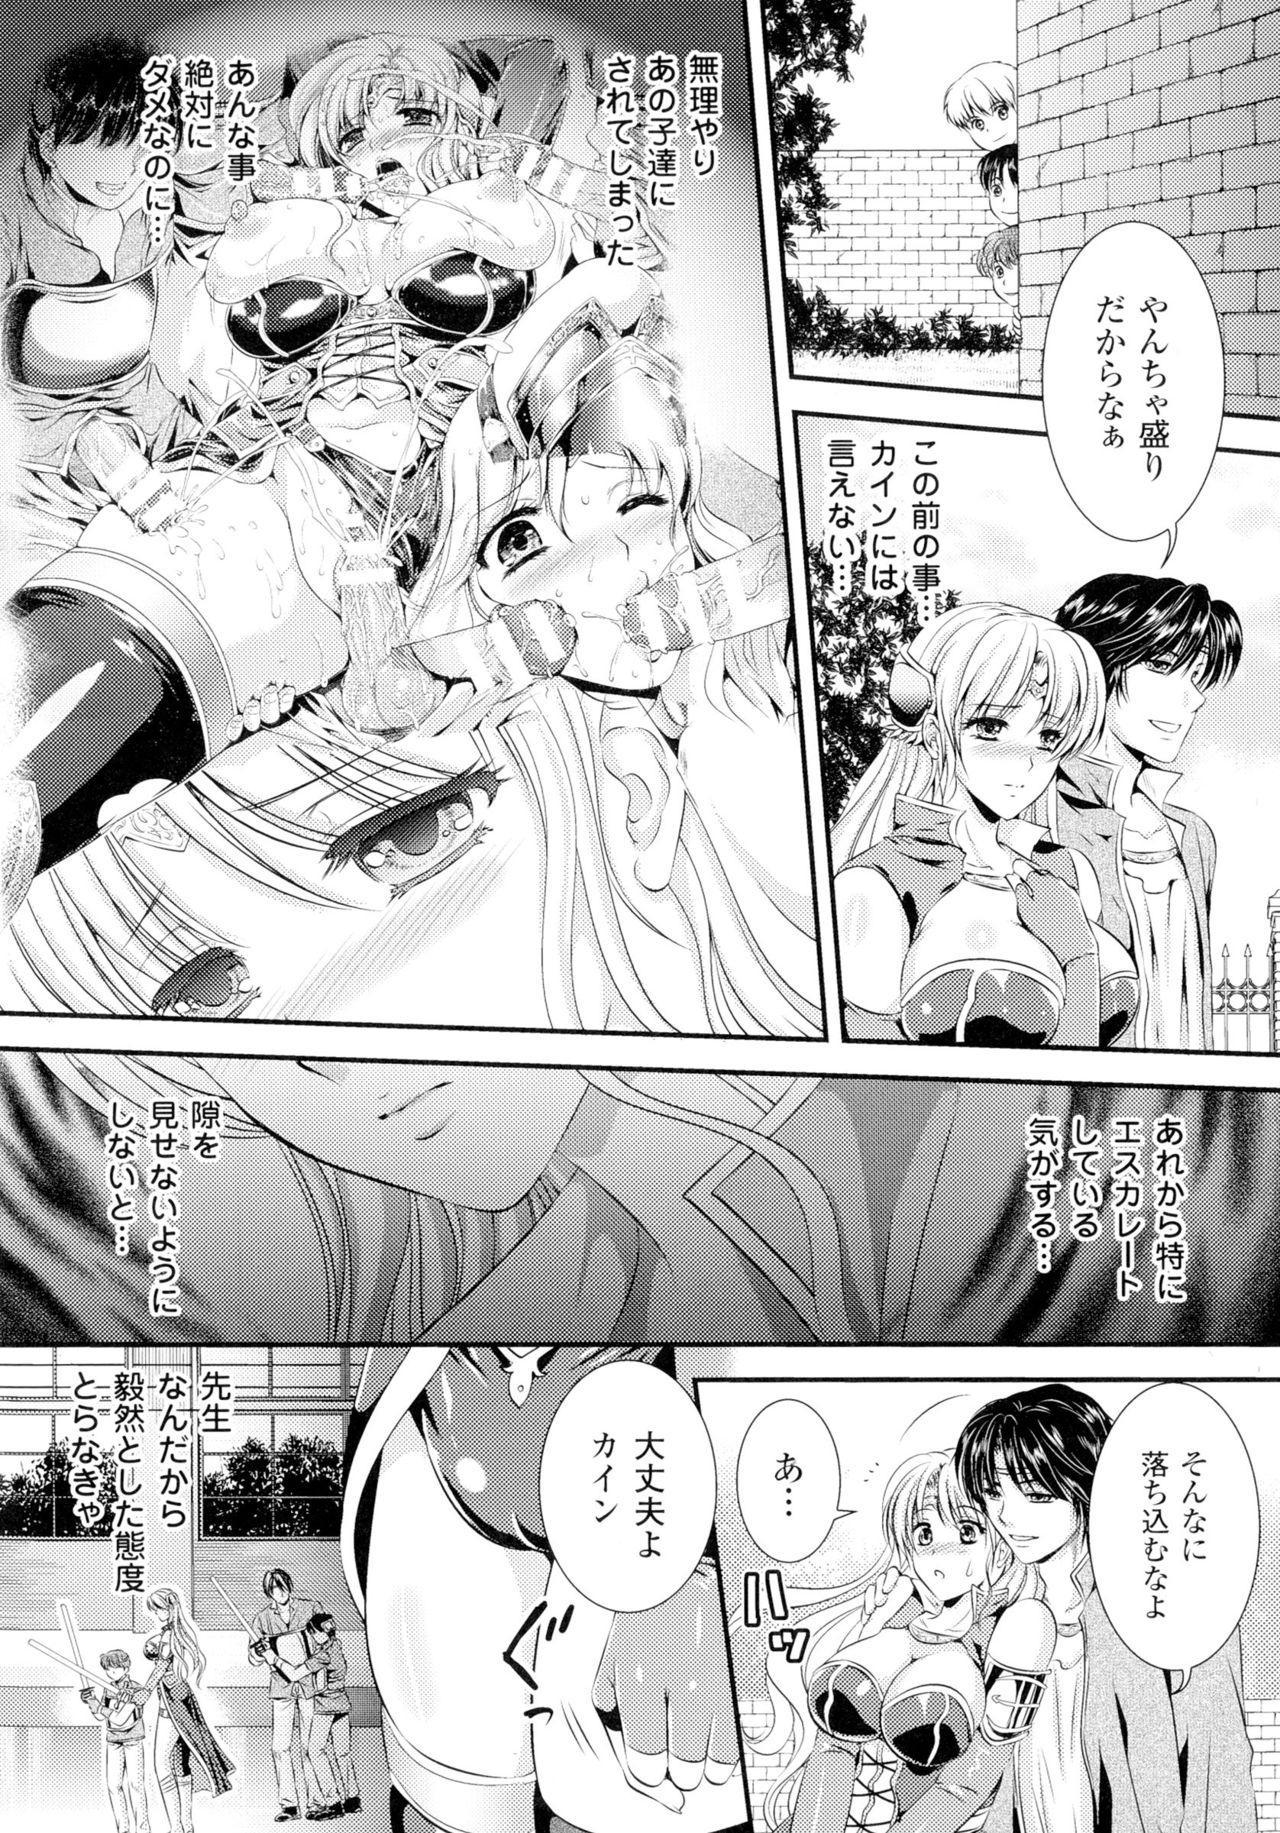 Seigi no Heroine Kangoku File DX Vol. 1 199